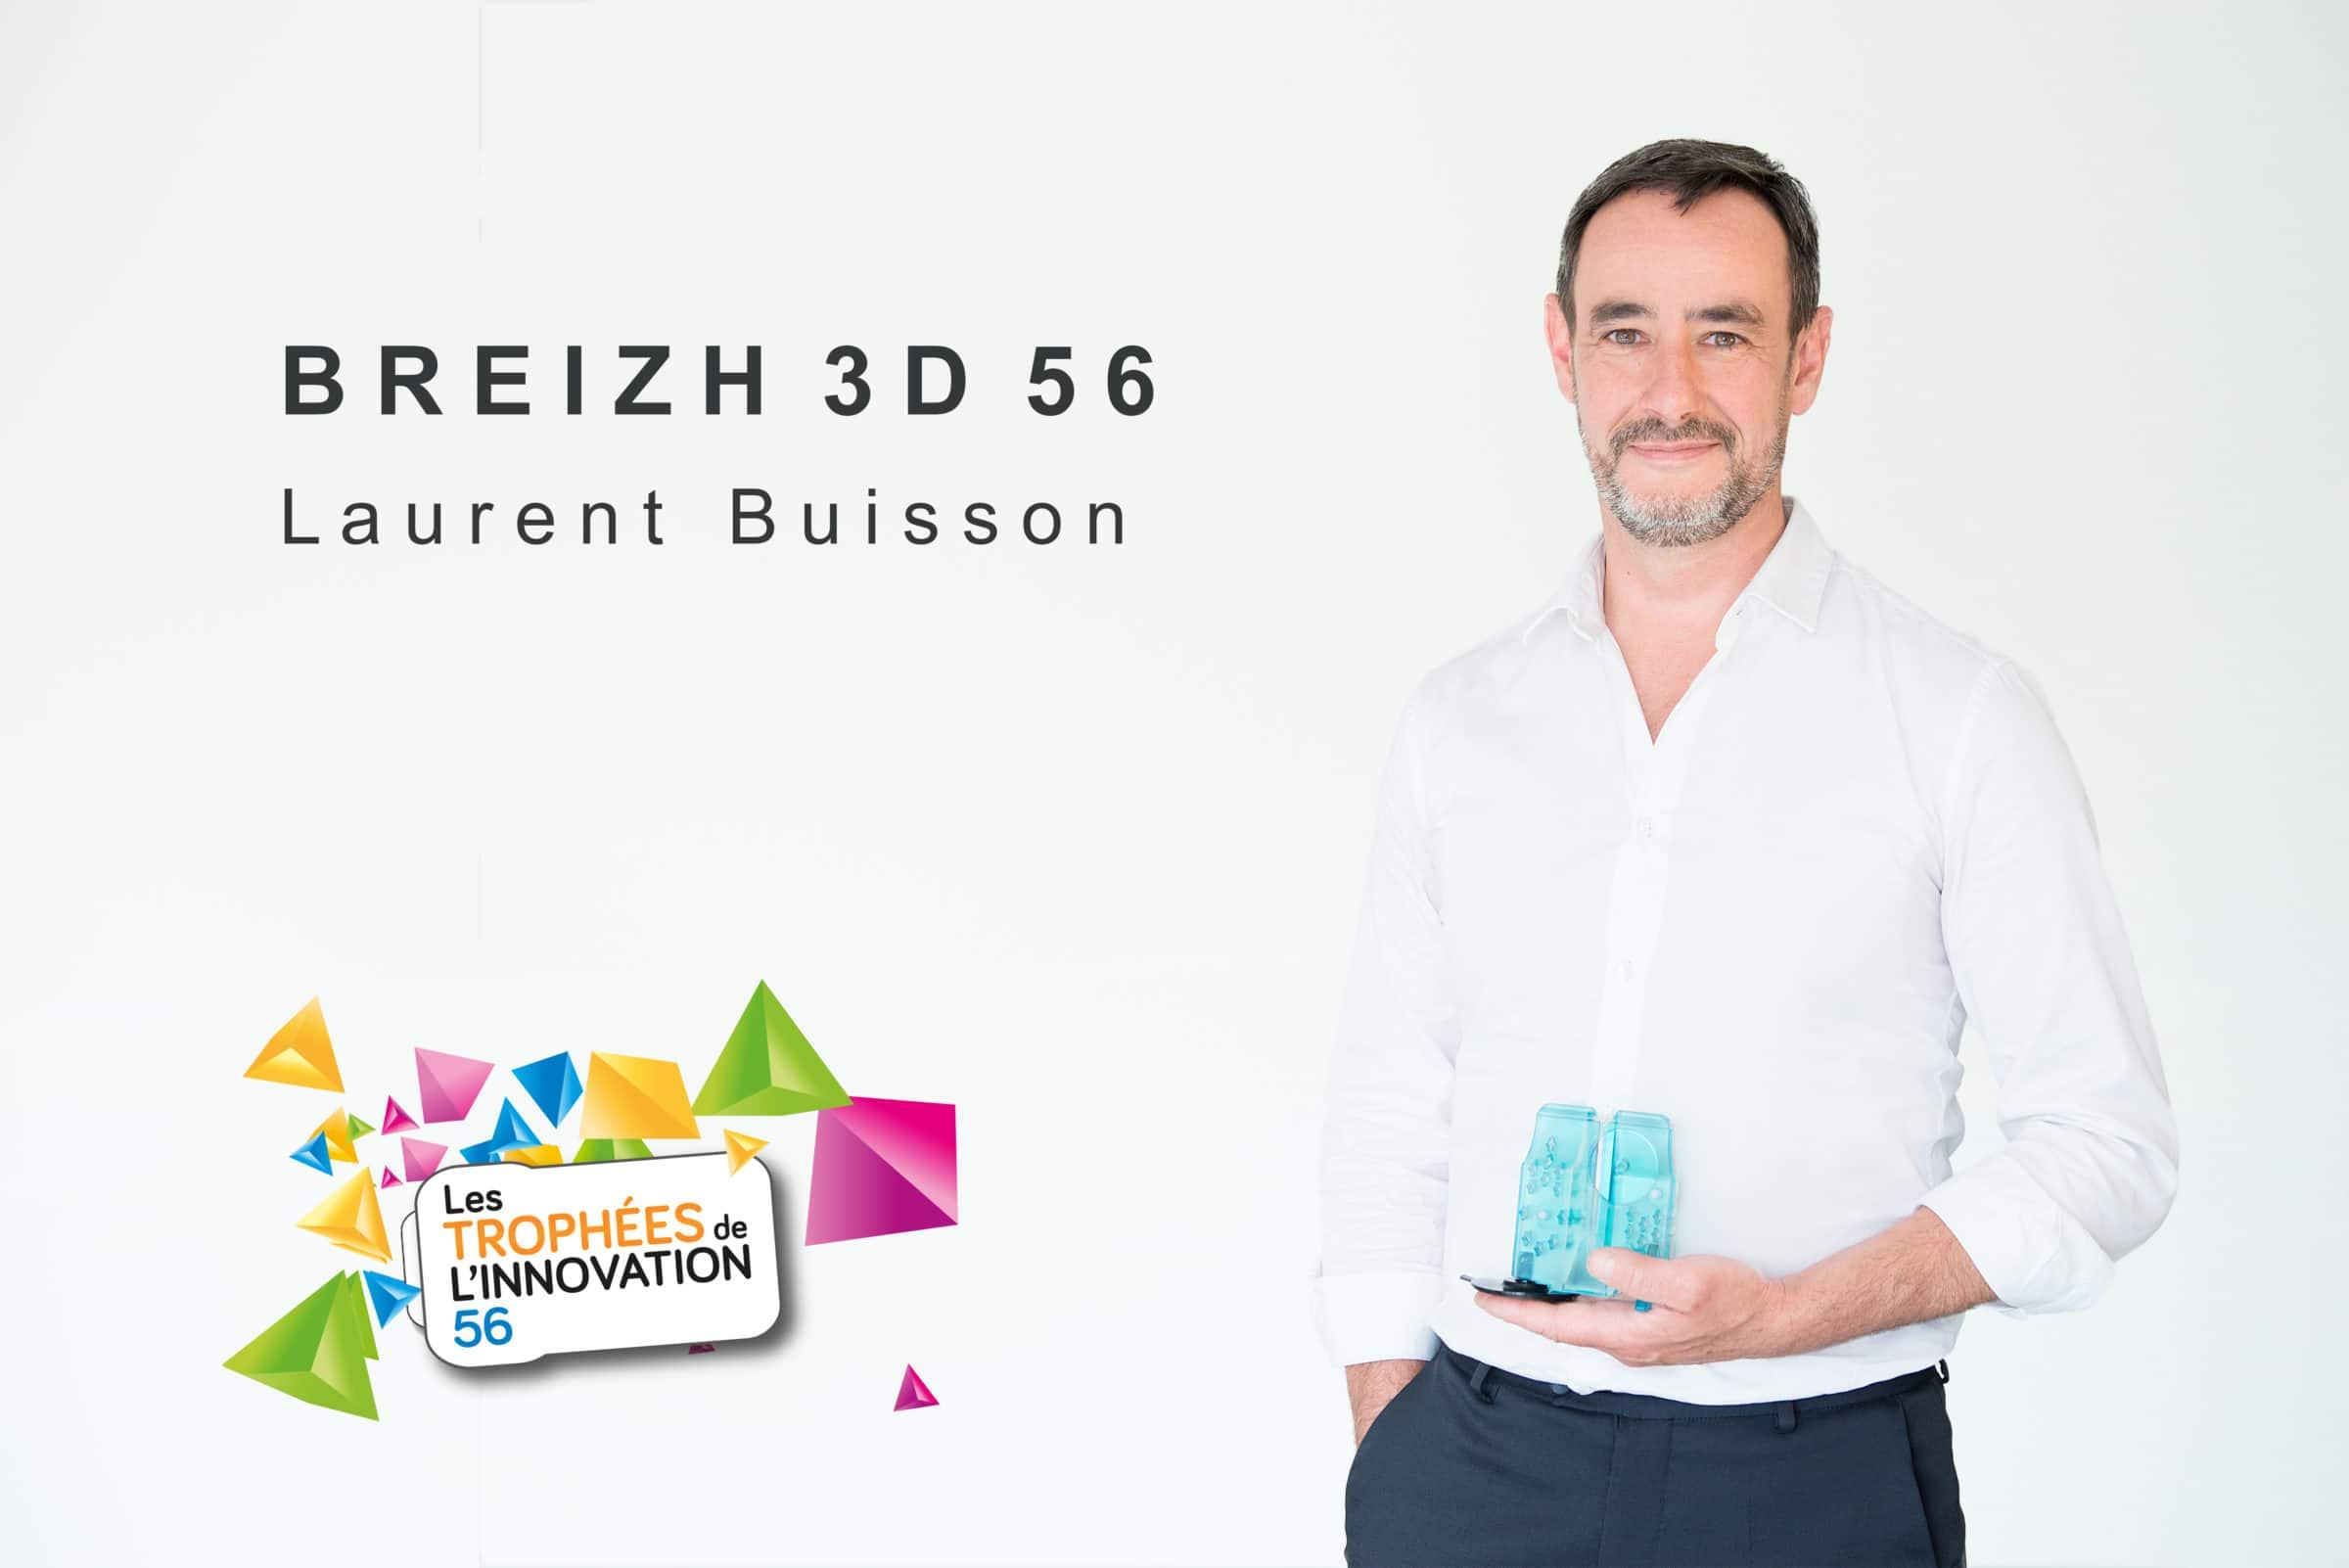 BREIZH 3D Laurent Buisson @SIRVAIN